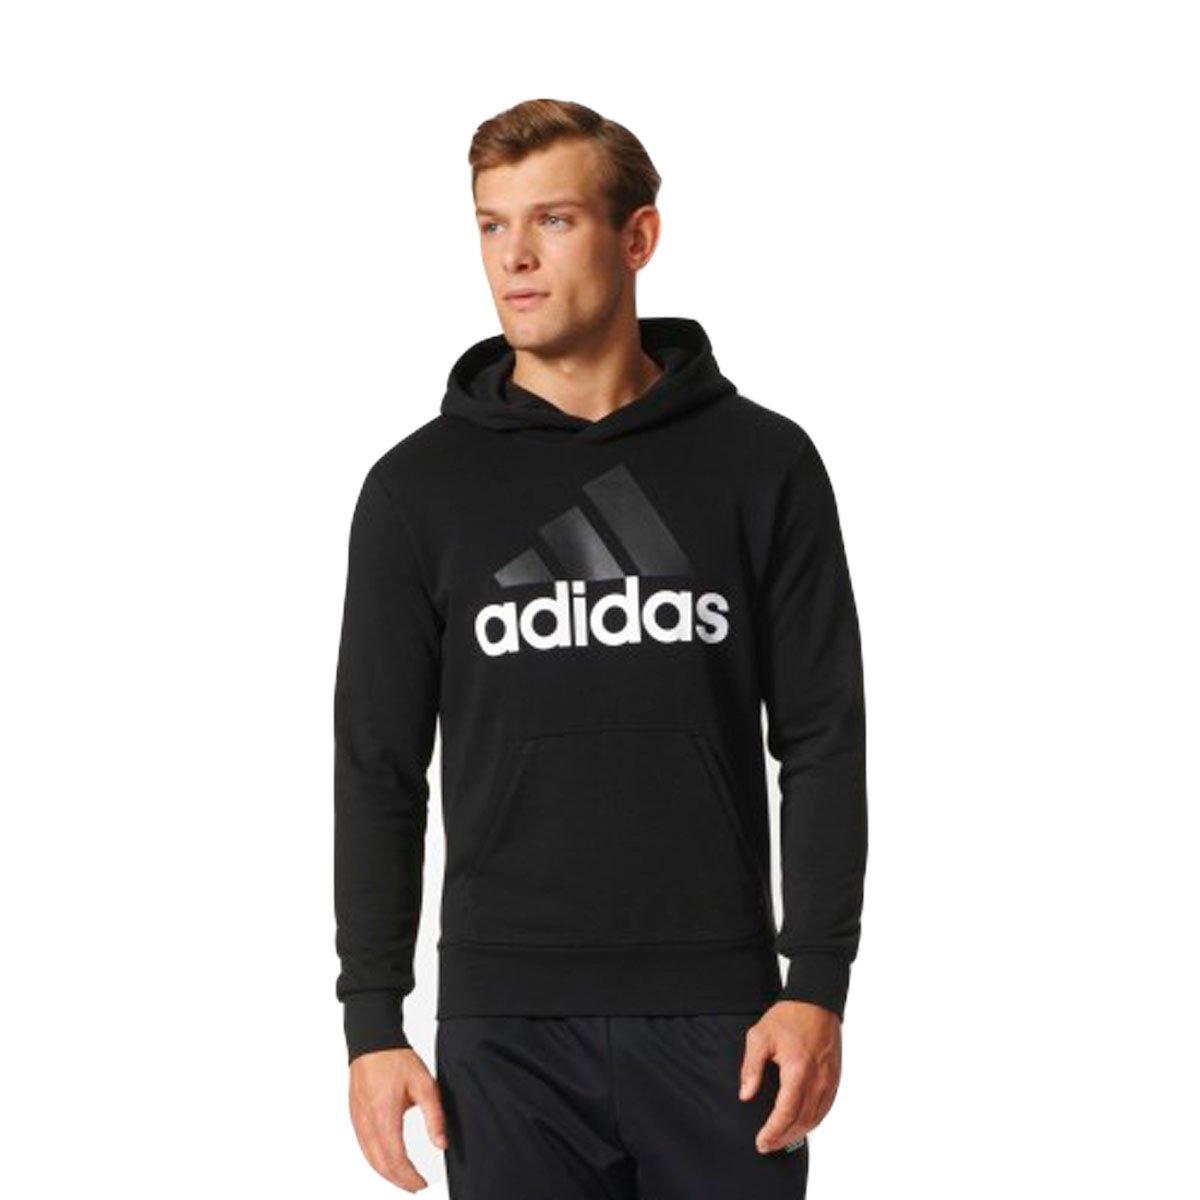 c10d1154c6b Bizz Store - Moletom Masculino Adidas Essentials Linear Preto